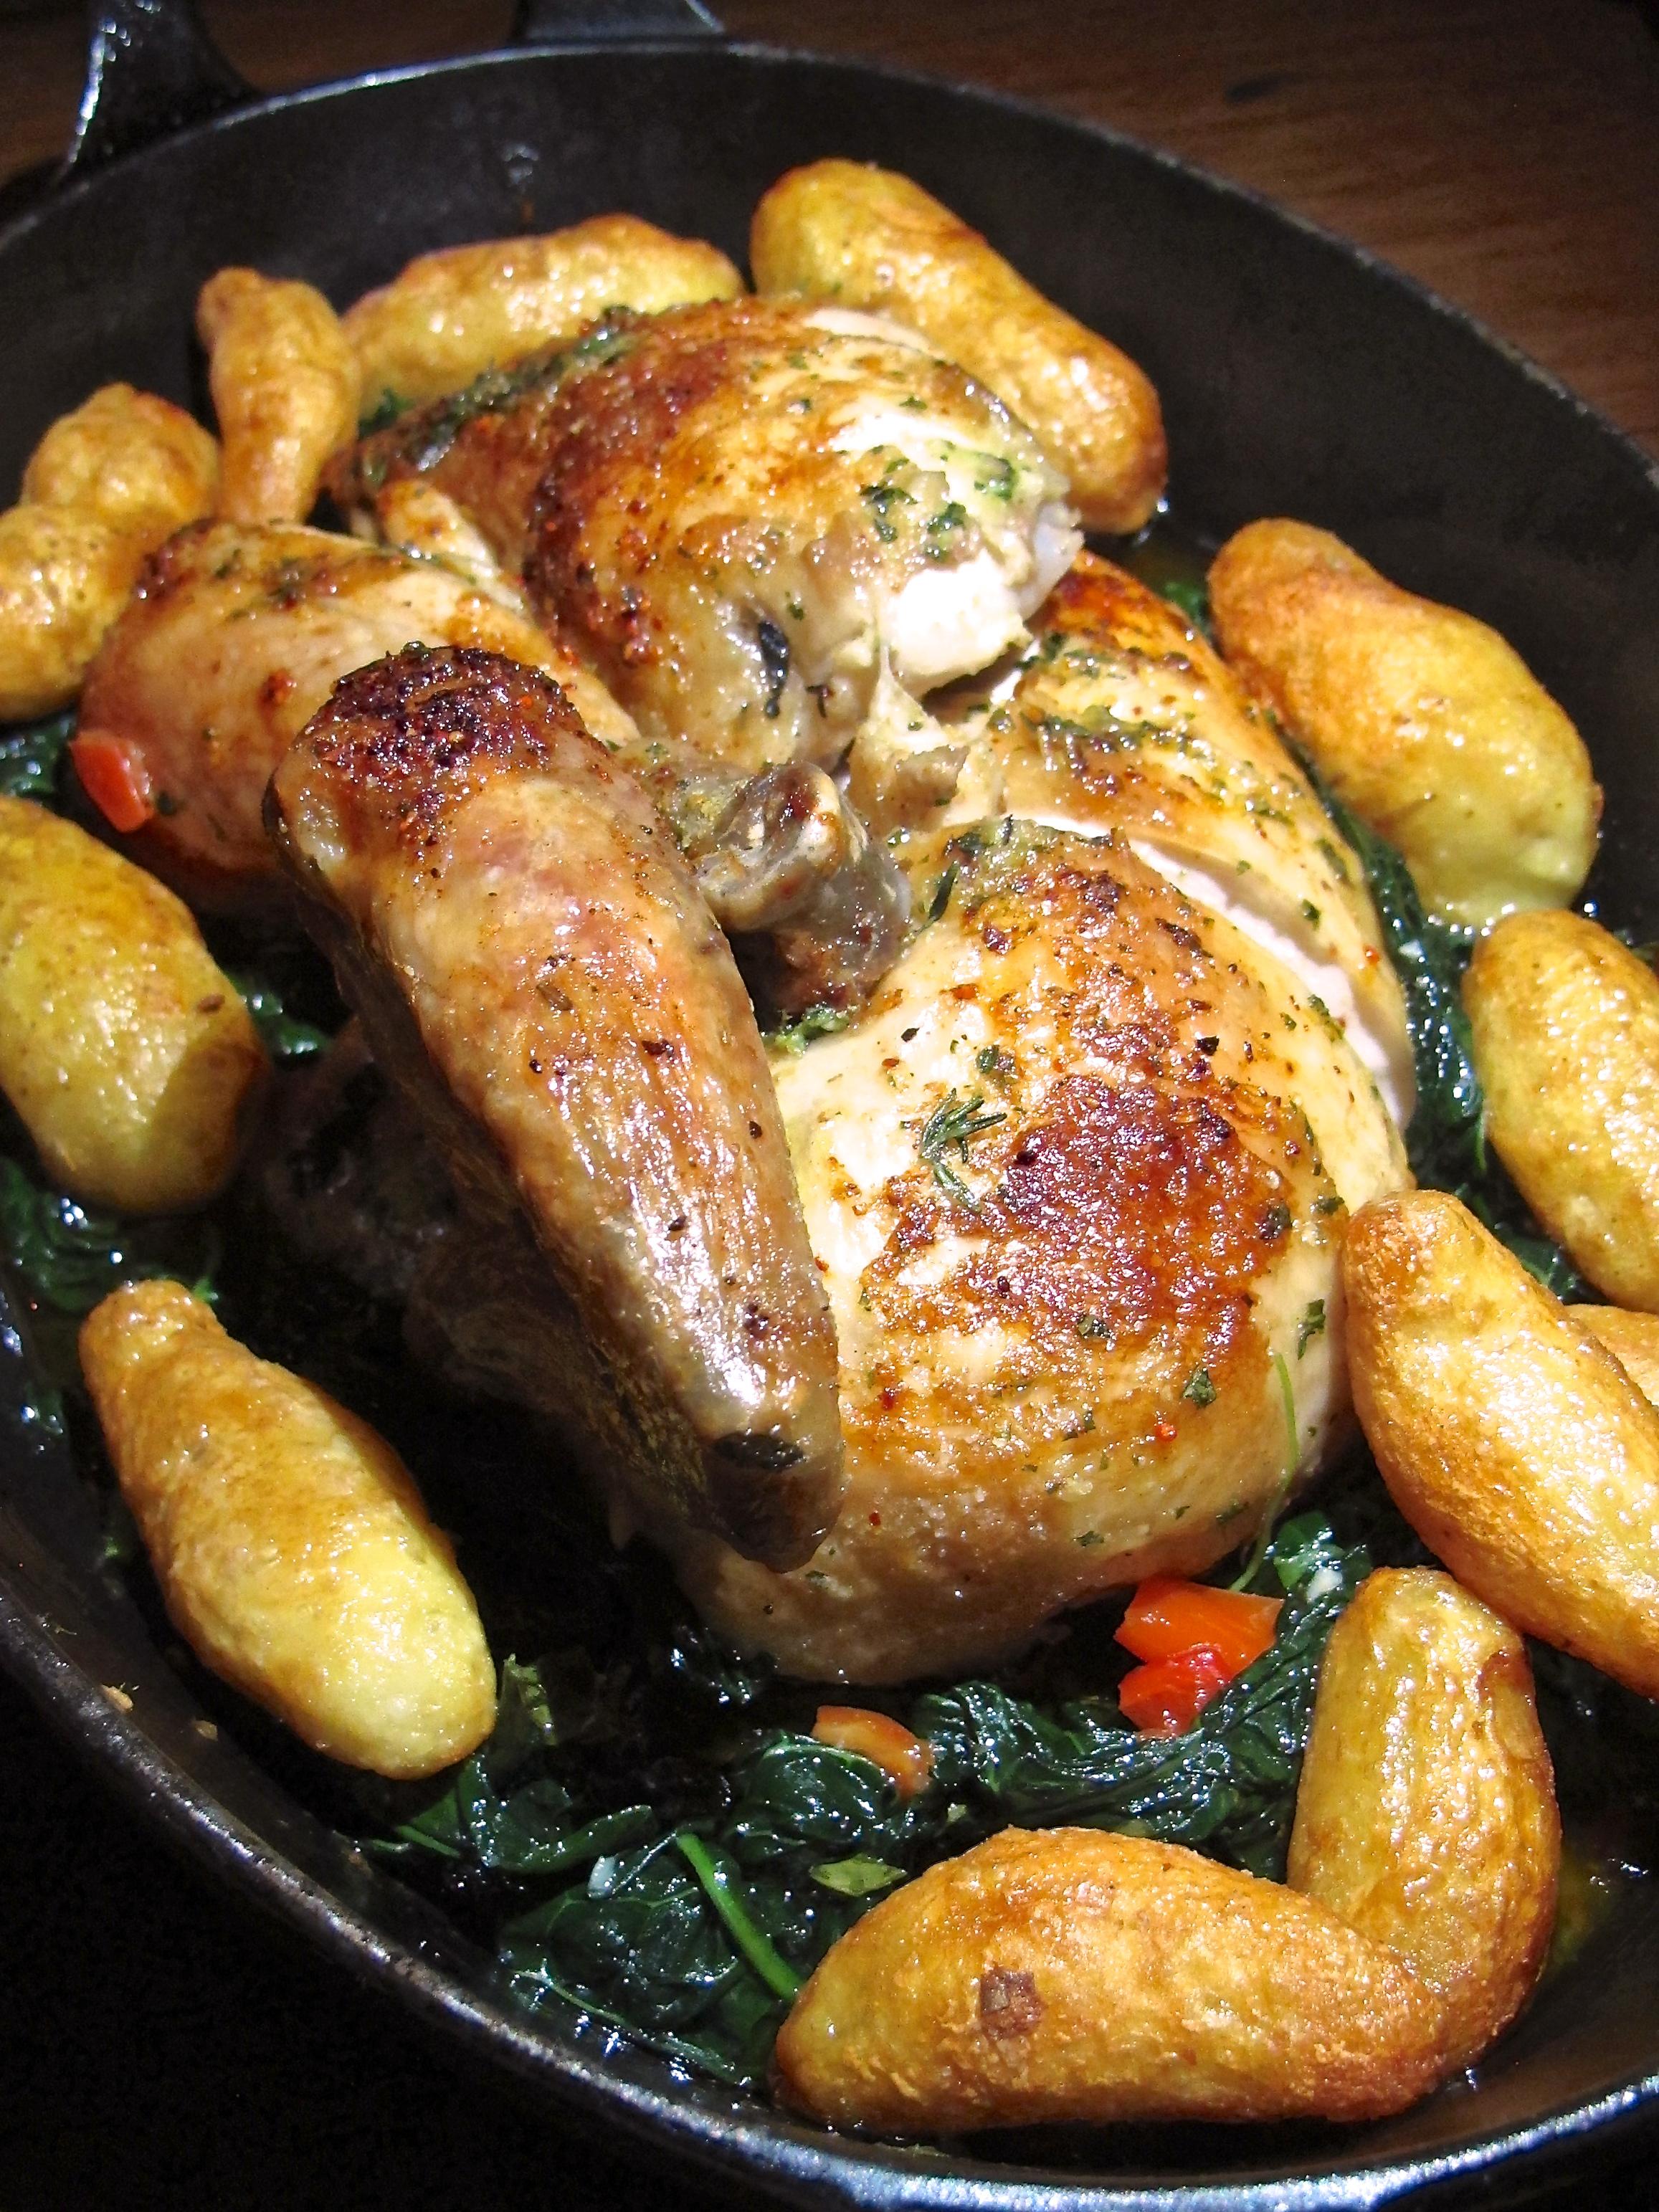 Republique's rotisserie chicken